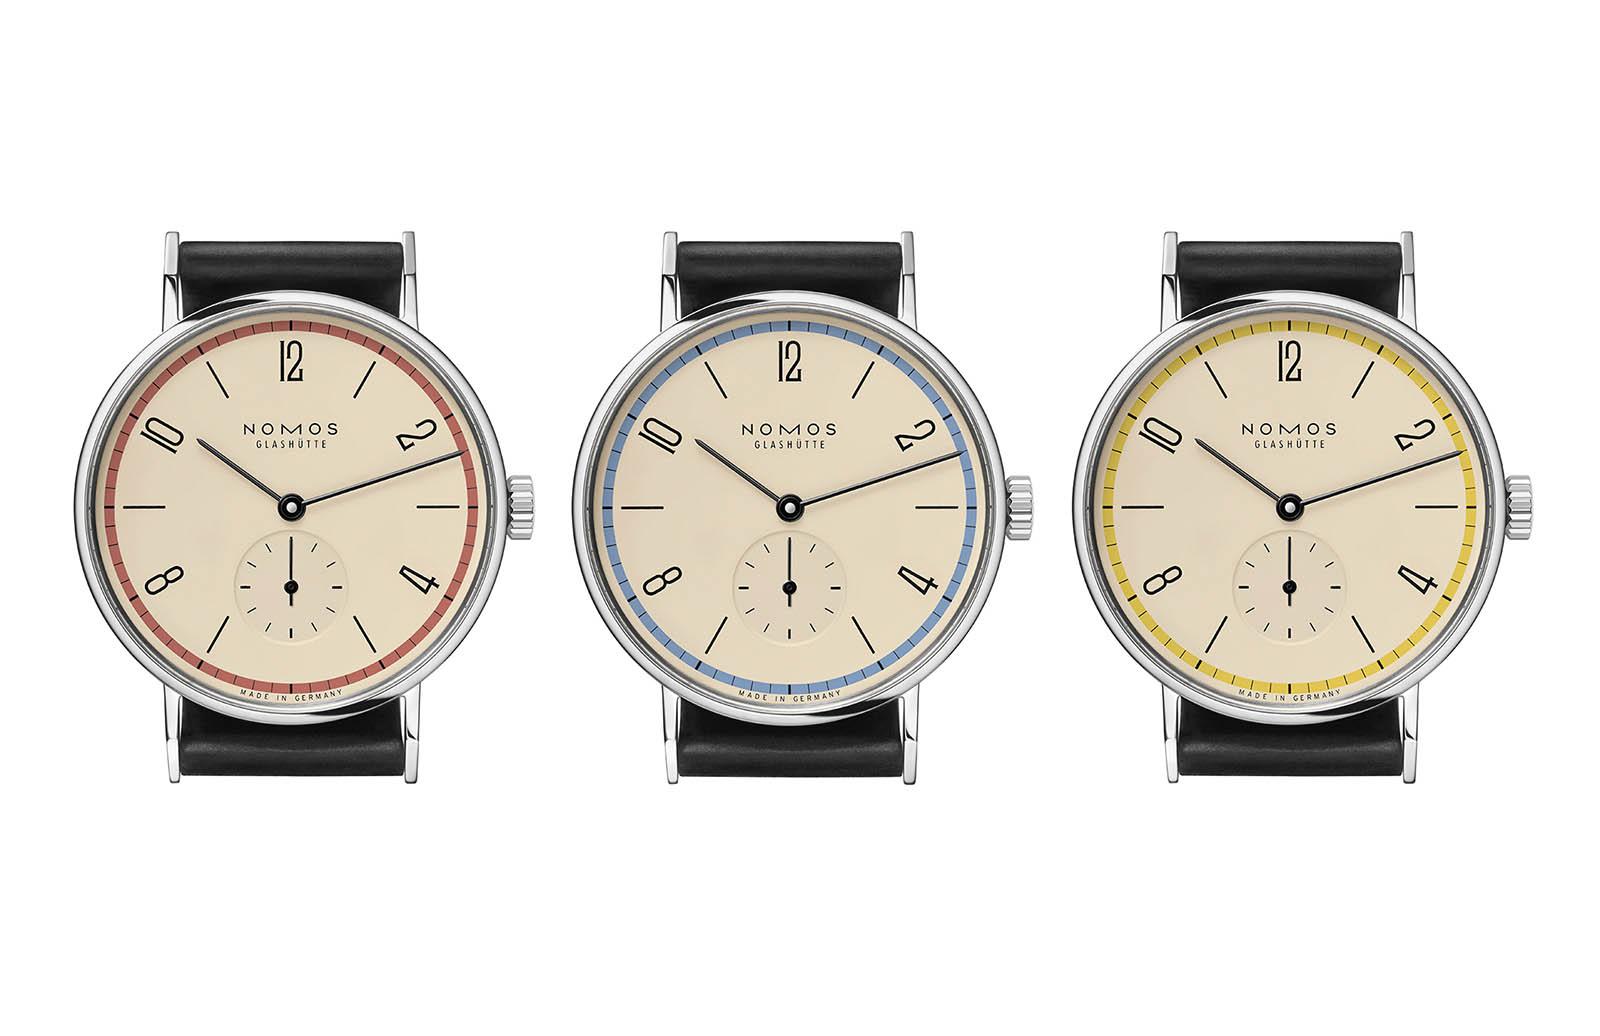 Nomos Tangente 'A Century of Bauhaus' Limited Editions